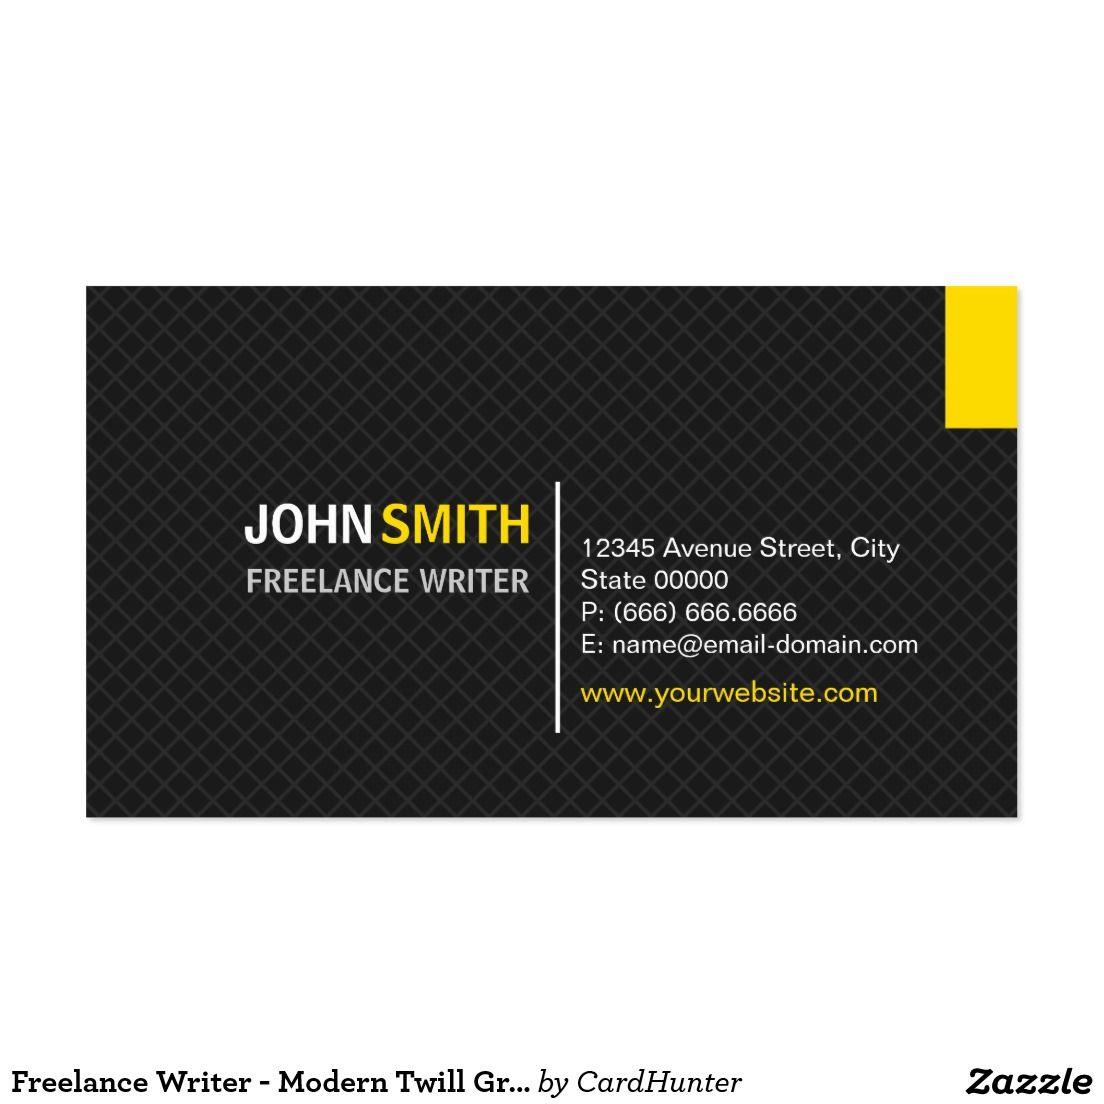 Create Your Own Profile Card Zazzle Com Letterpress Business Cards Construction Business Cards Unique Business Cards